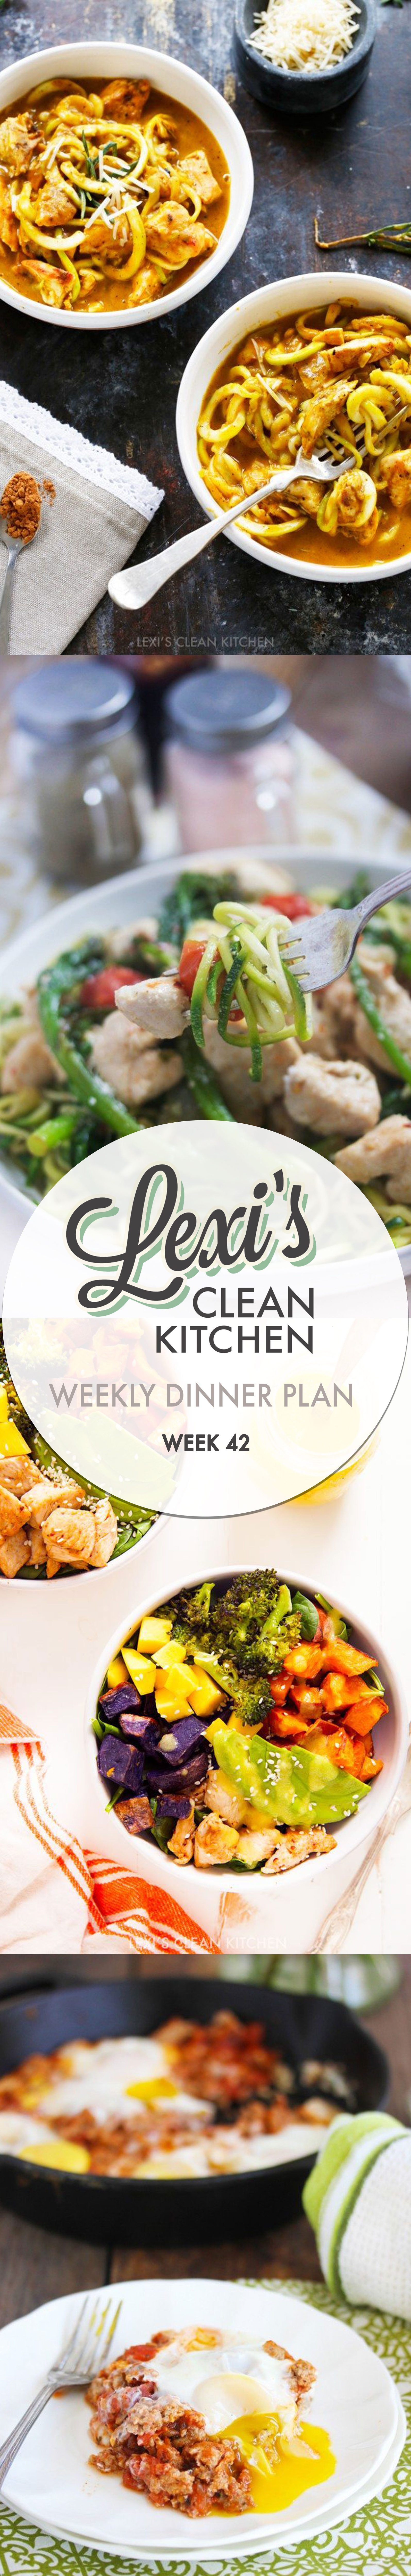 Weekly Dinner Plan Week 42 | Lexi's Clean Kitchen